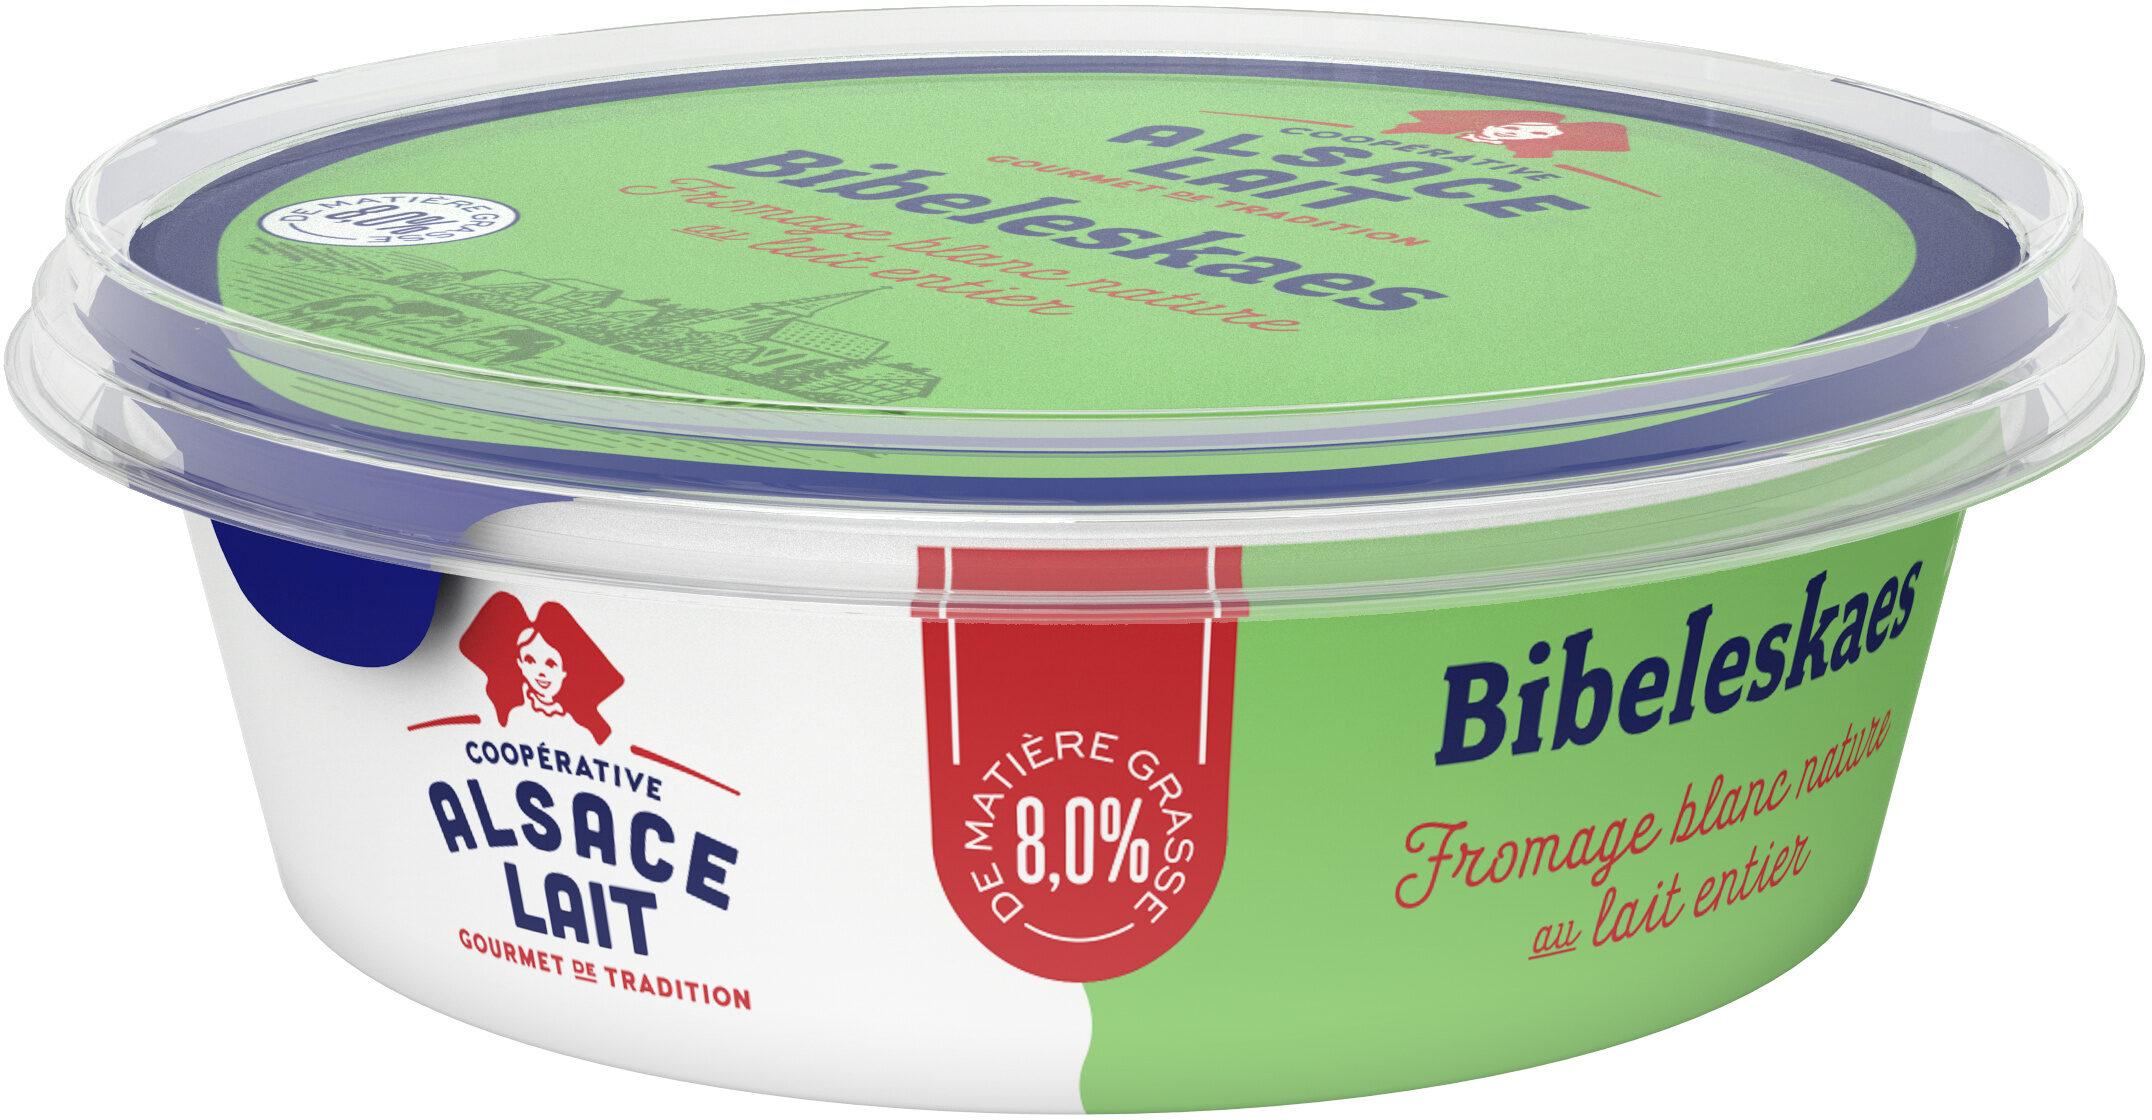 Fromage blanc nature - Bibeleskaes - Produit - fr